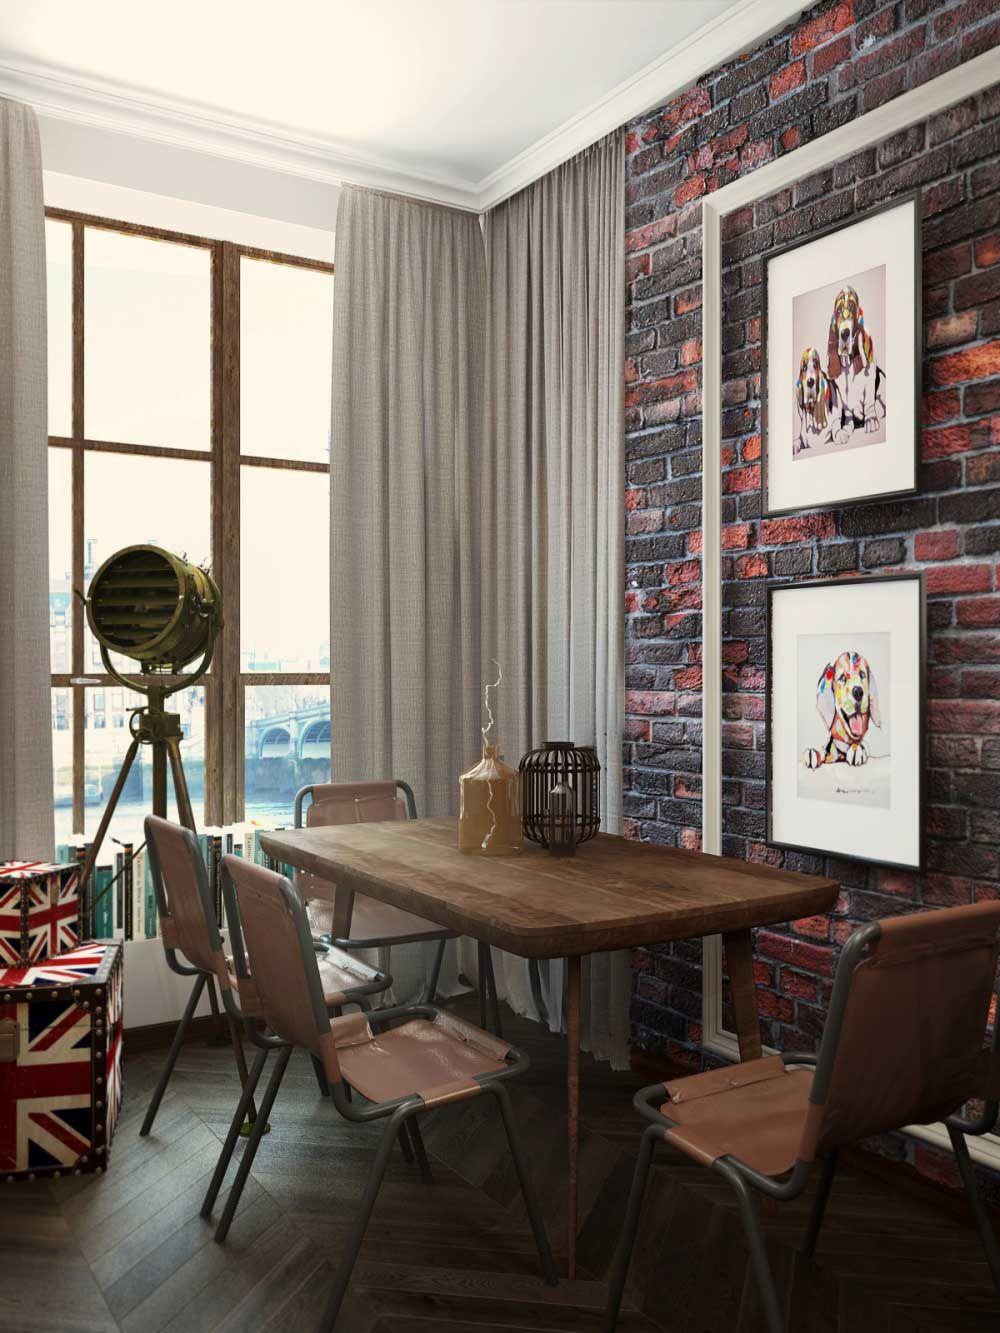 Дизайн кухни студии - фото. Дизайн комнаты студии с кухней ...